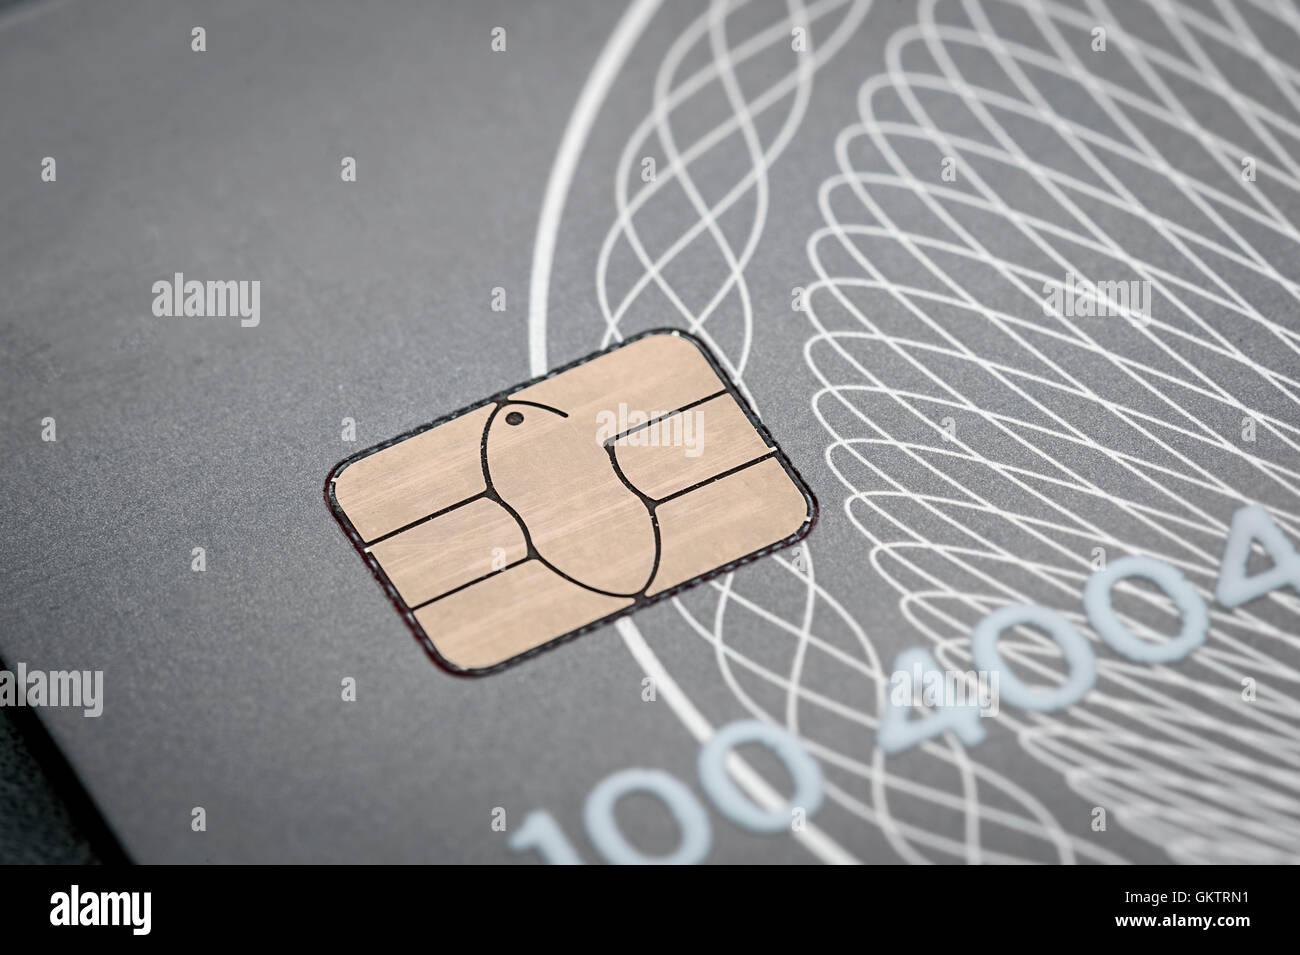 EMV Credit Card Chip Detail - Stock Image